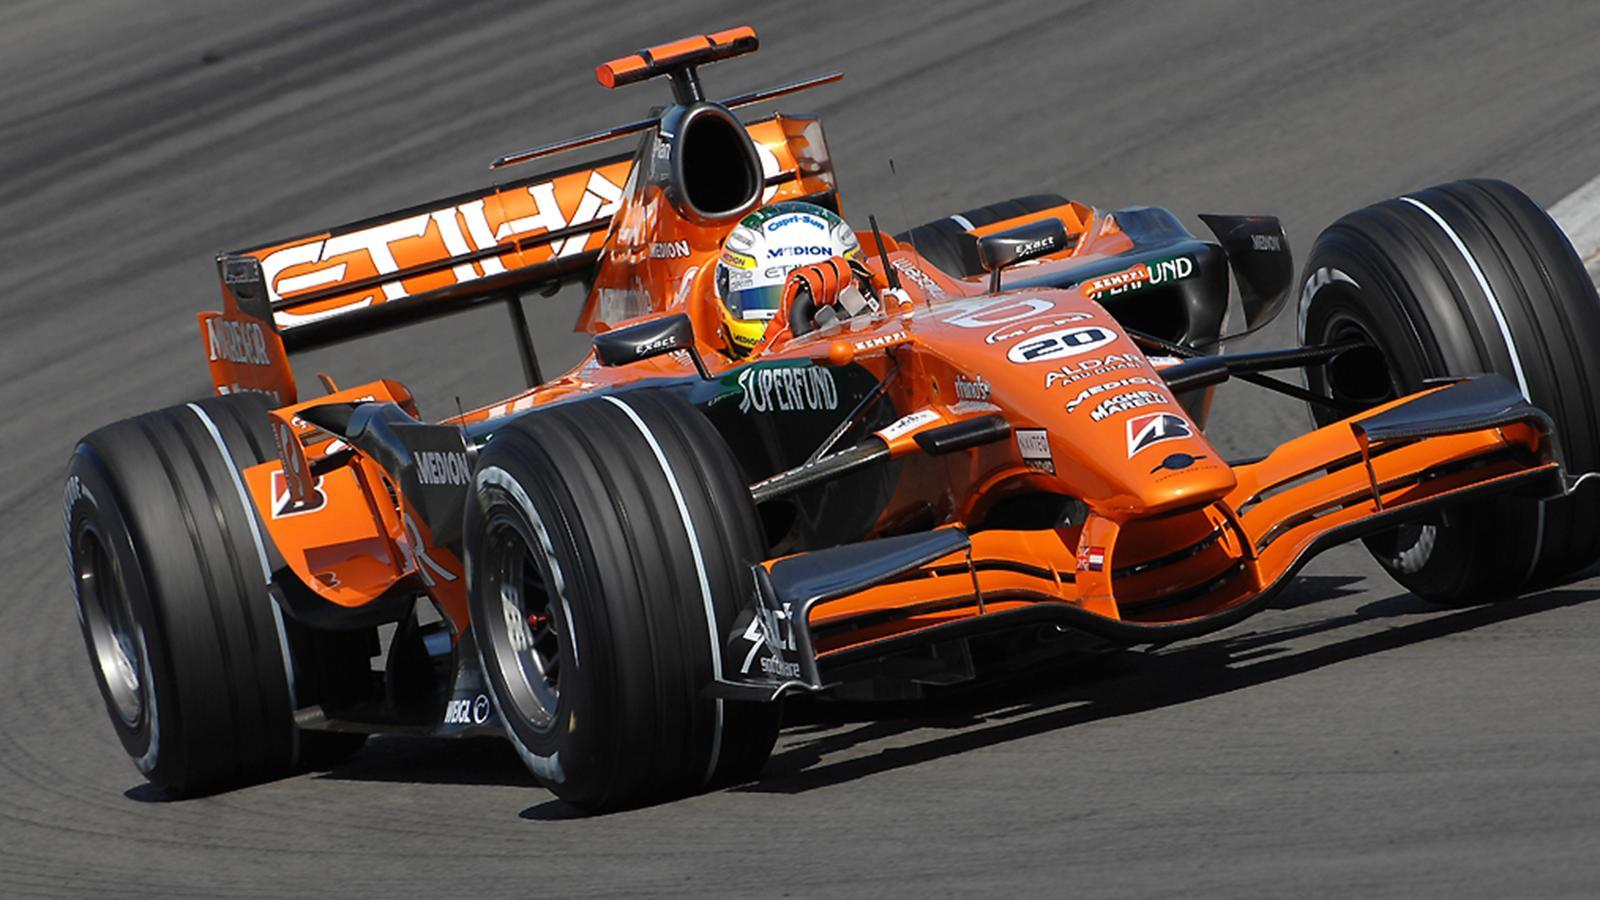 Spyker vendue saison 2007 formule 1 eurosport - Formule vitesse de coupe ...